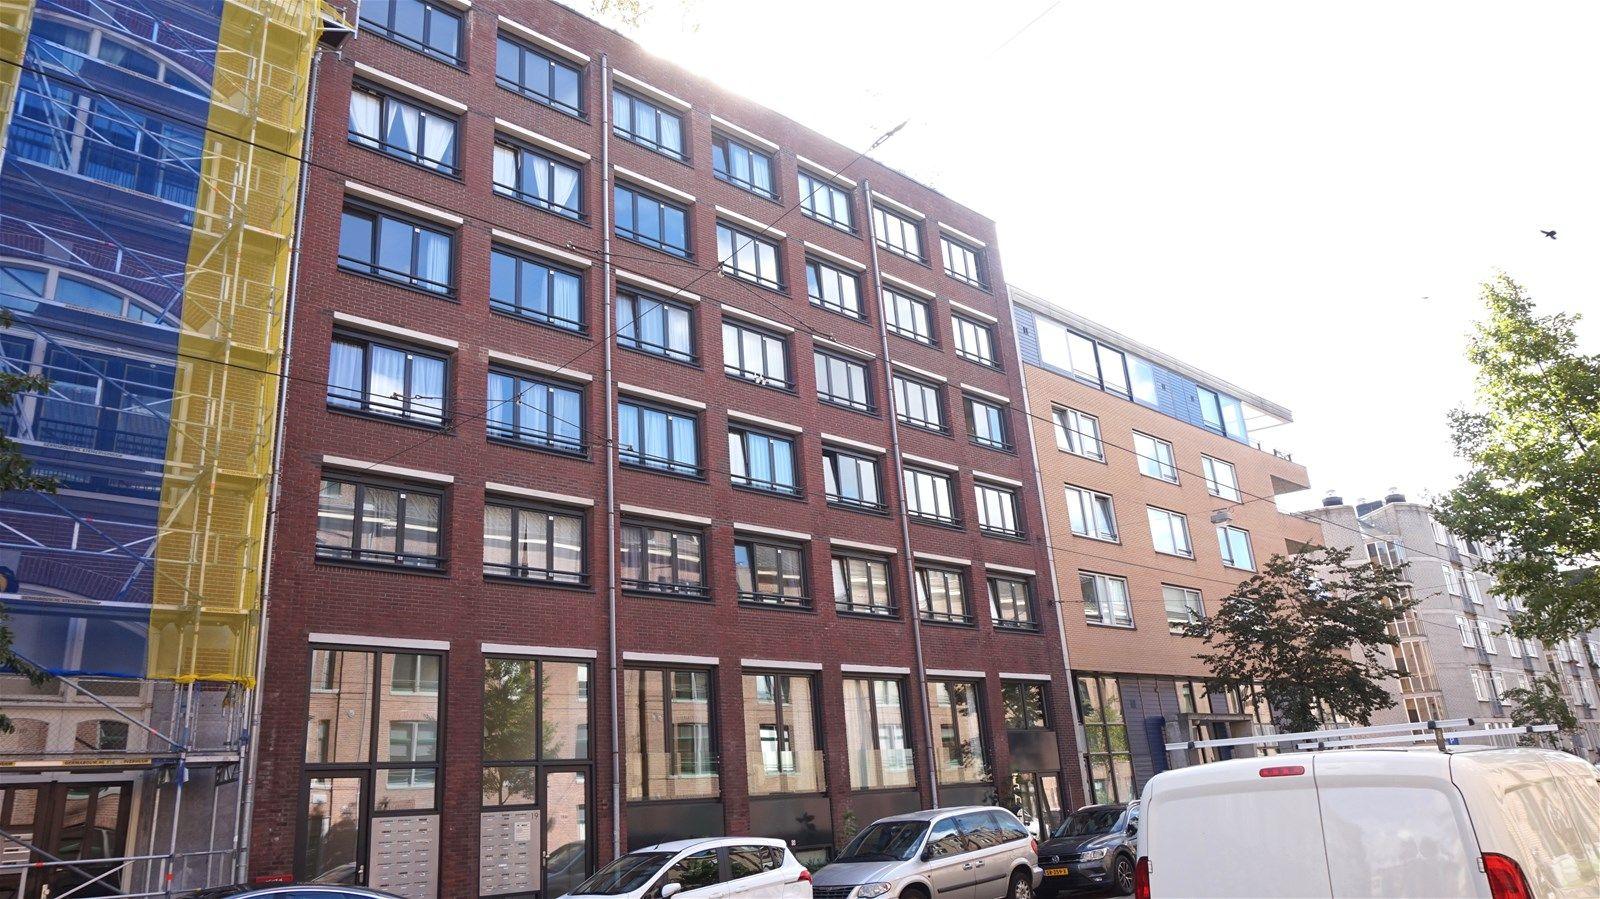 Planciusstraat, Amsterdam